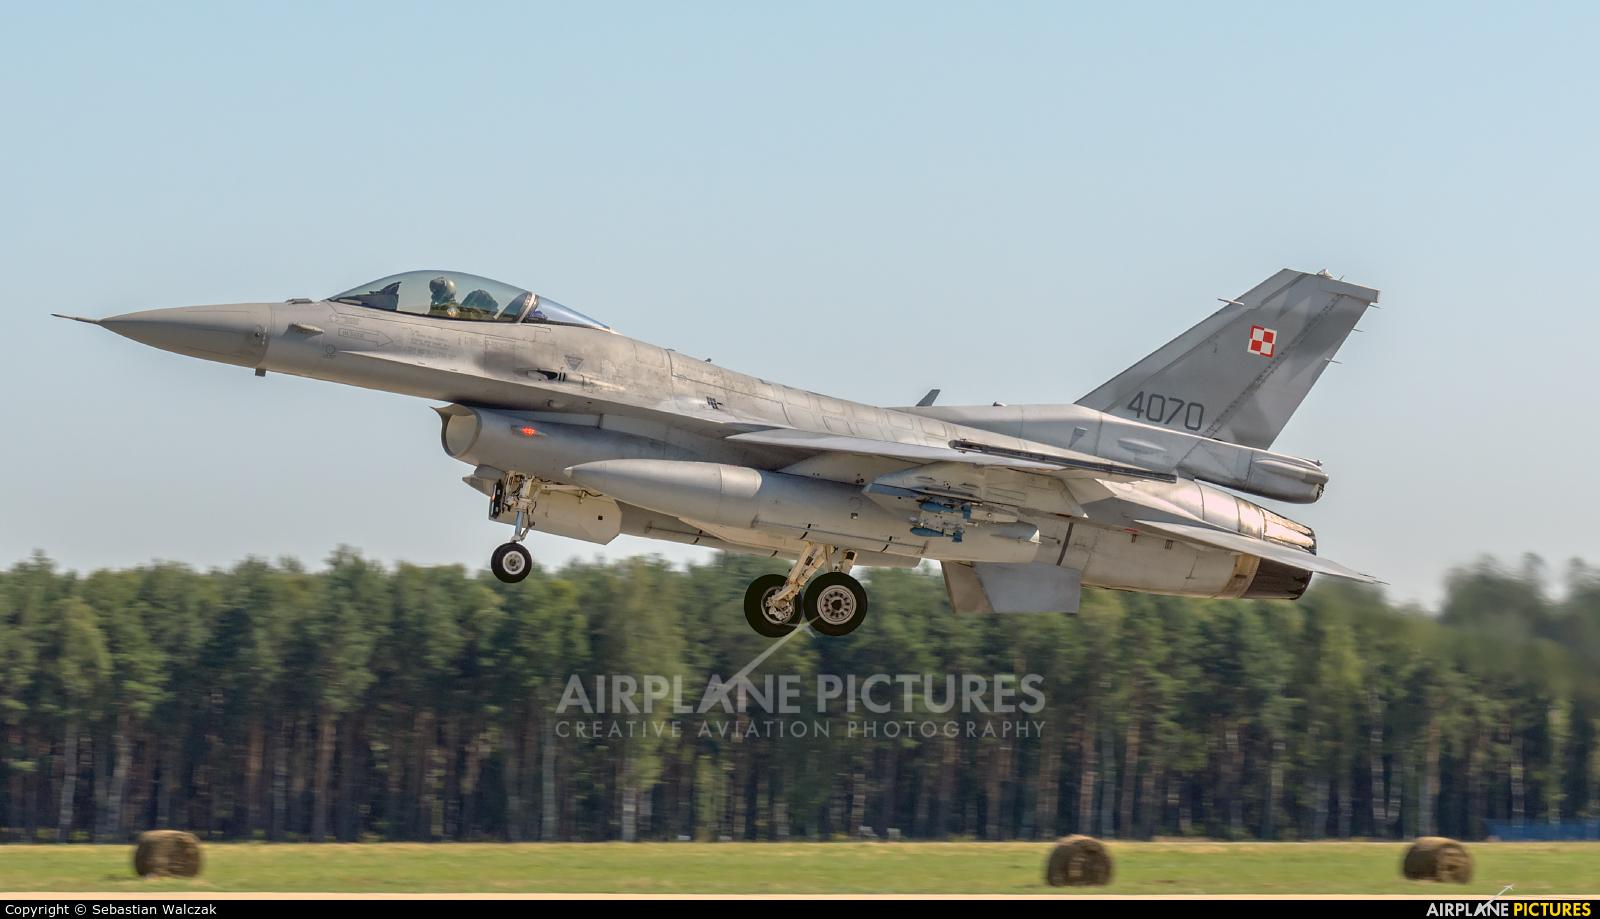 Poland - Air Force 4070 aircraft at Łask AB